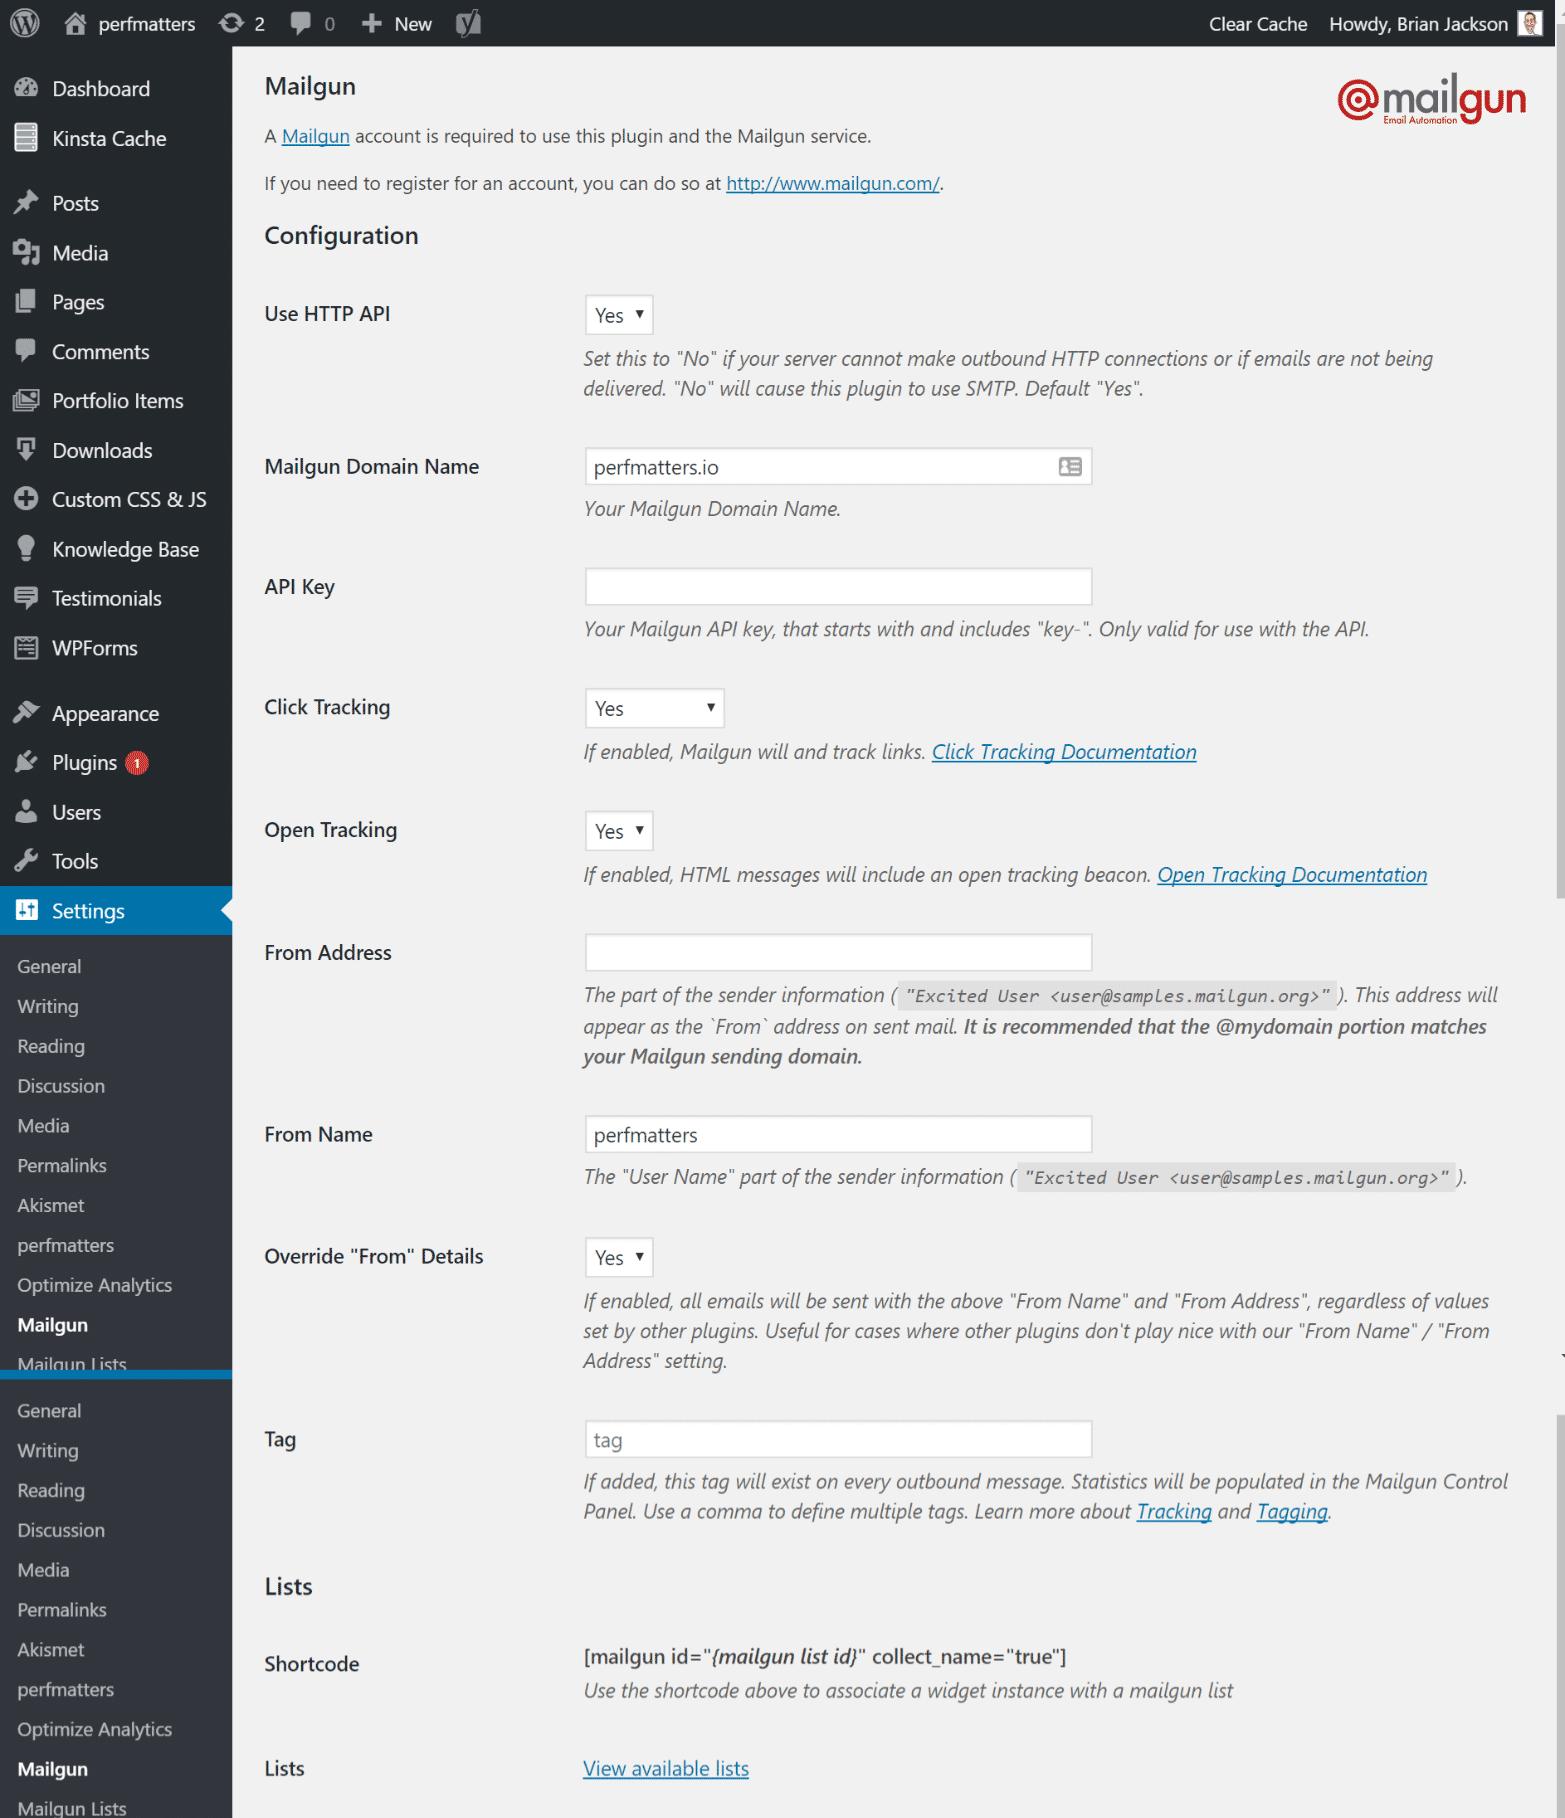 Configurações do plugin Mailgun